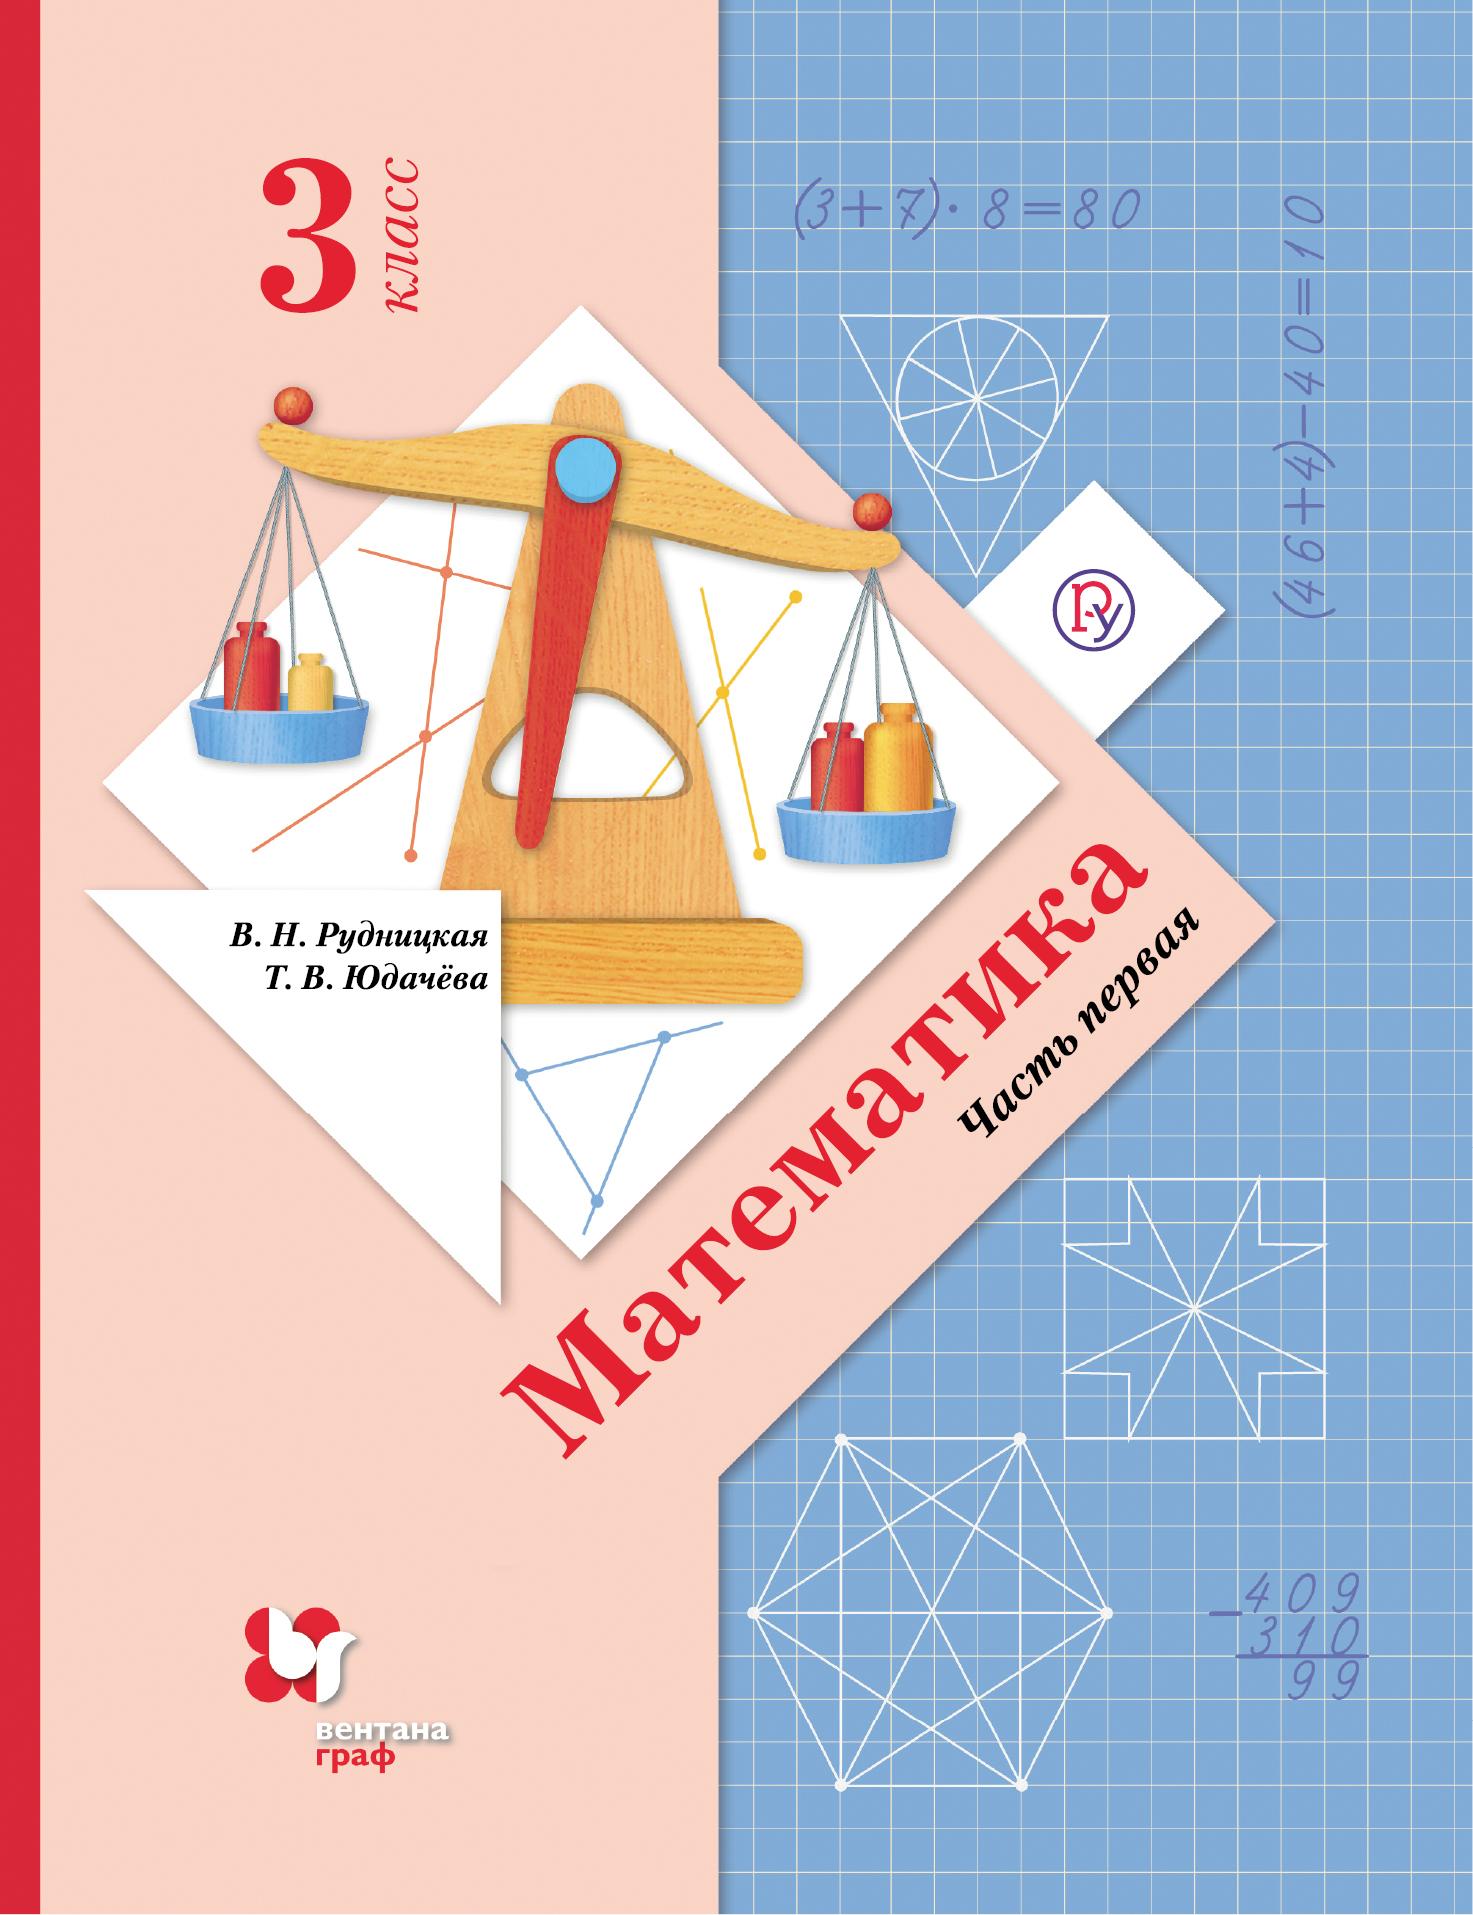 Математика. 3 класс. Учебник в 2-х частях. Ч. 1